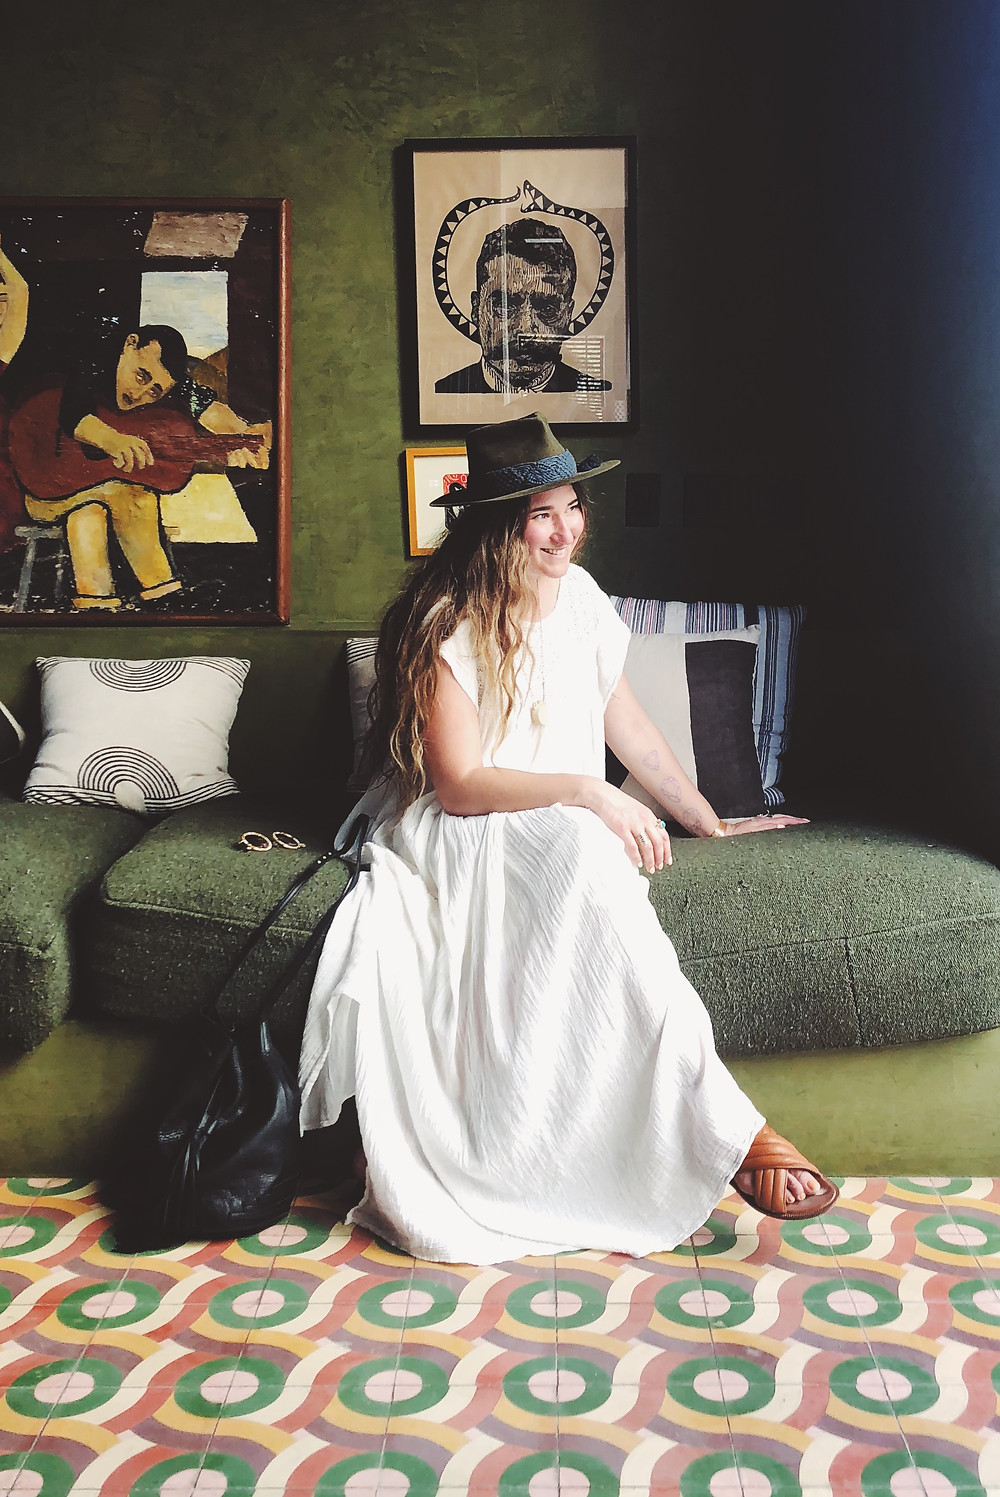 Best Places to Stay in Todos Santos - Emily Katz Travels Todo Santos Mexico - San Cristobal Hotel